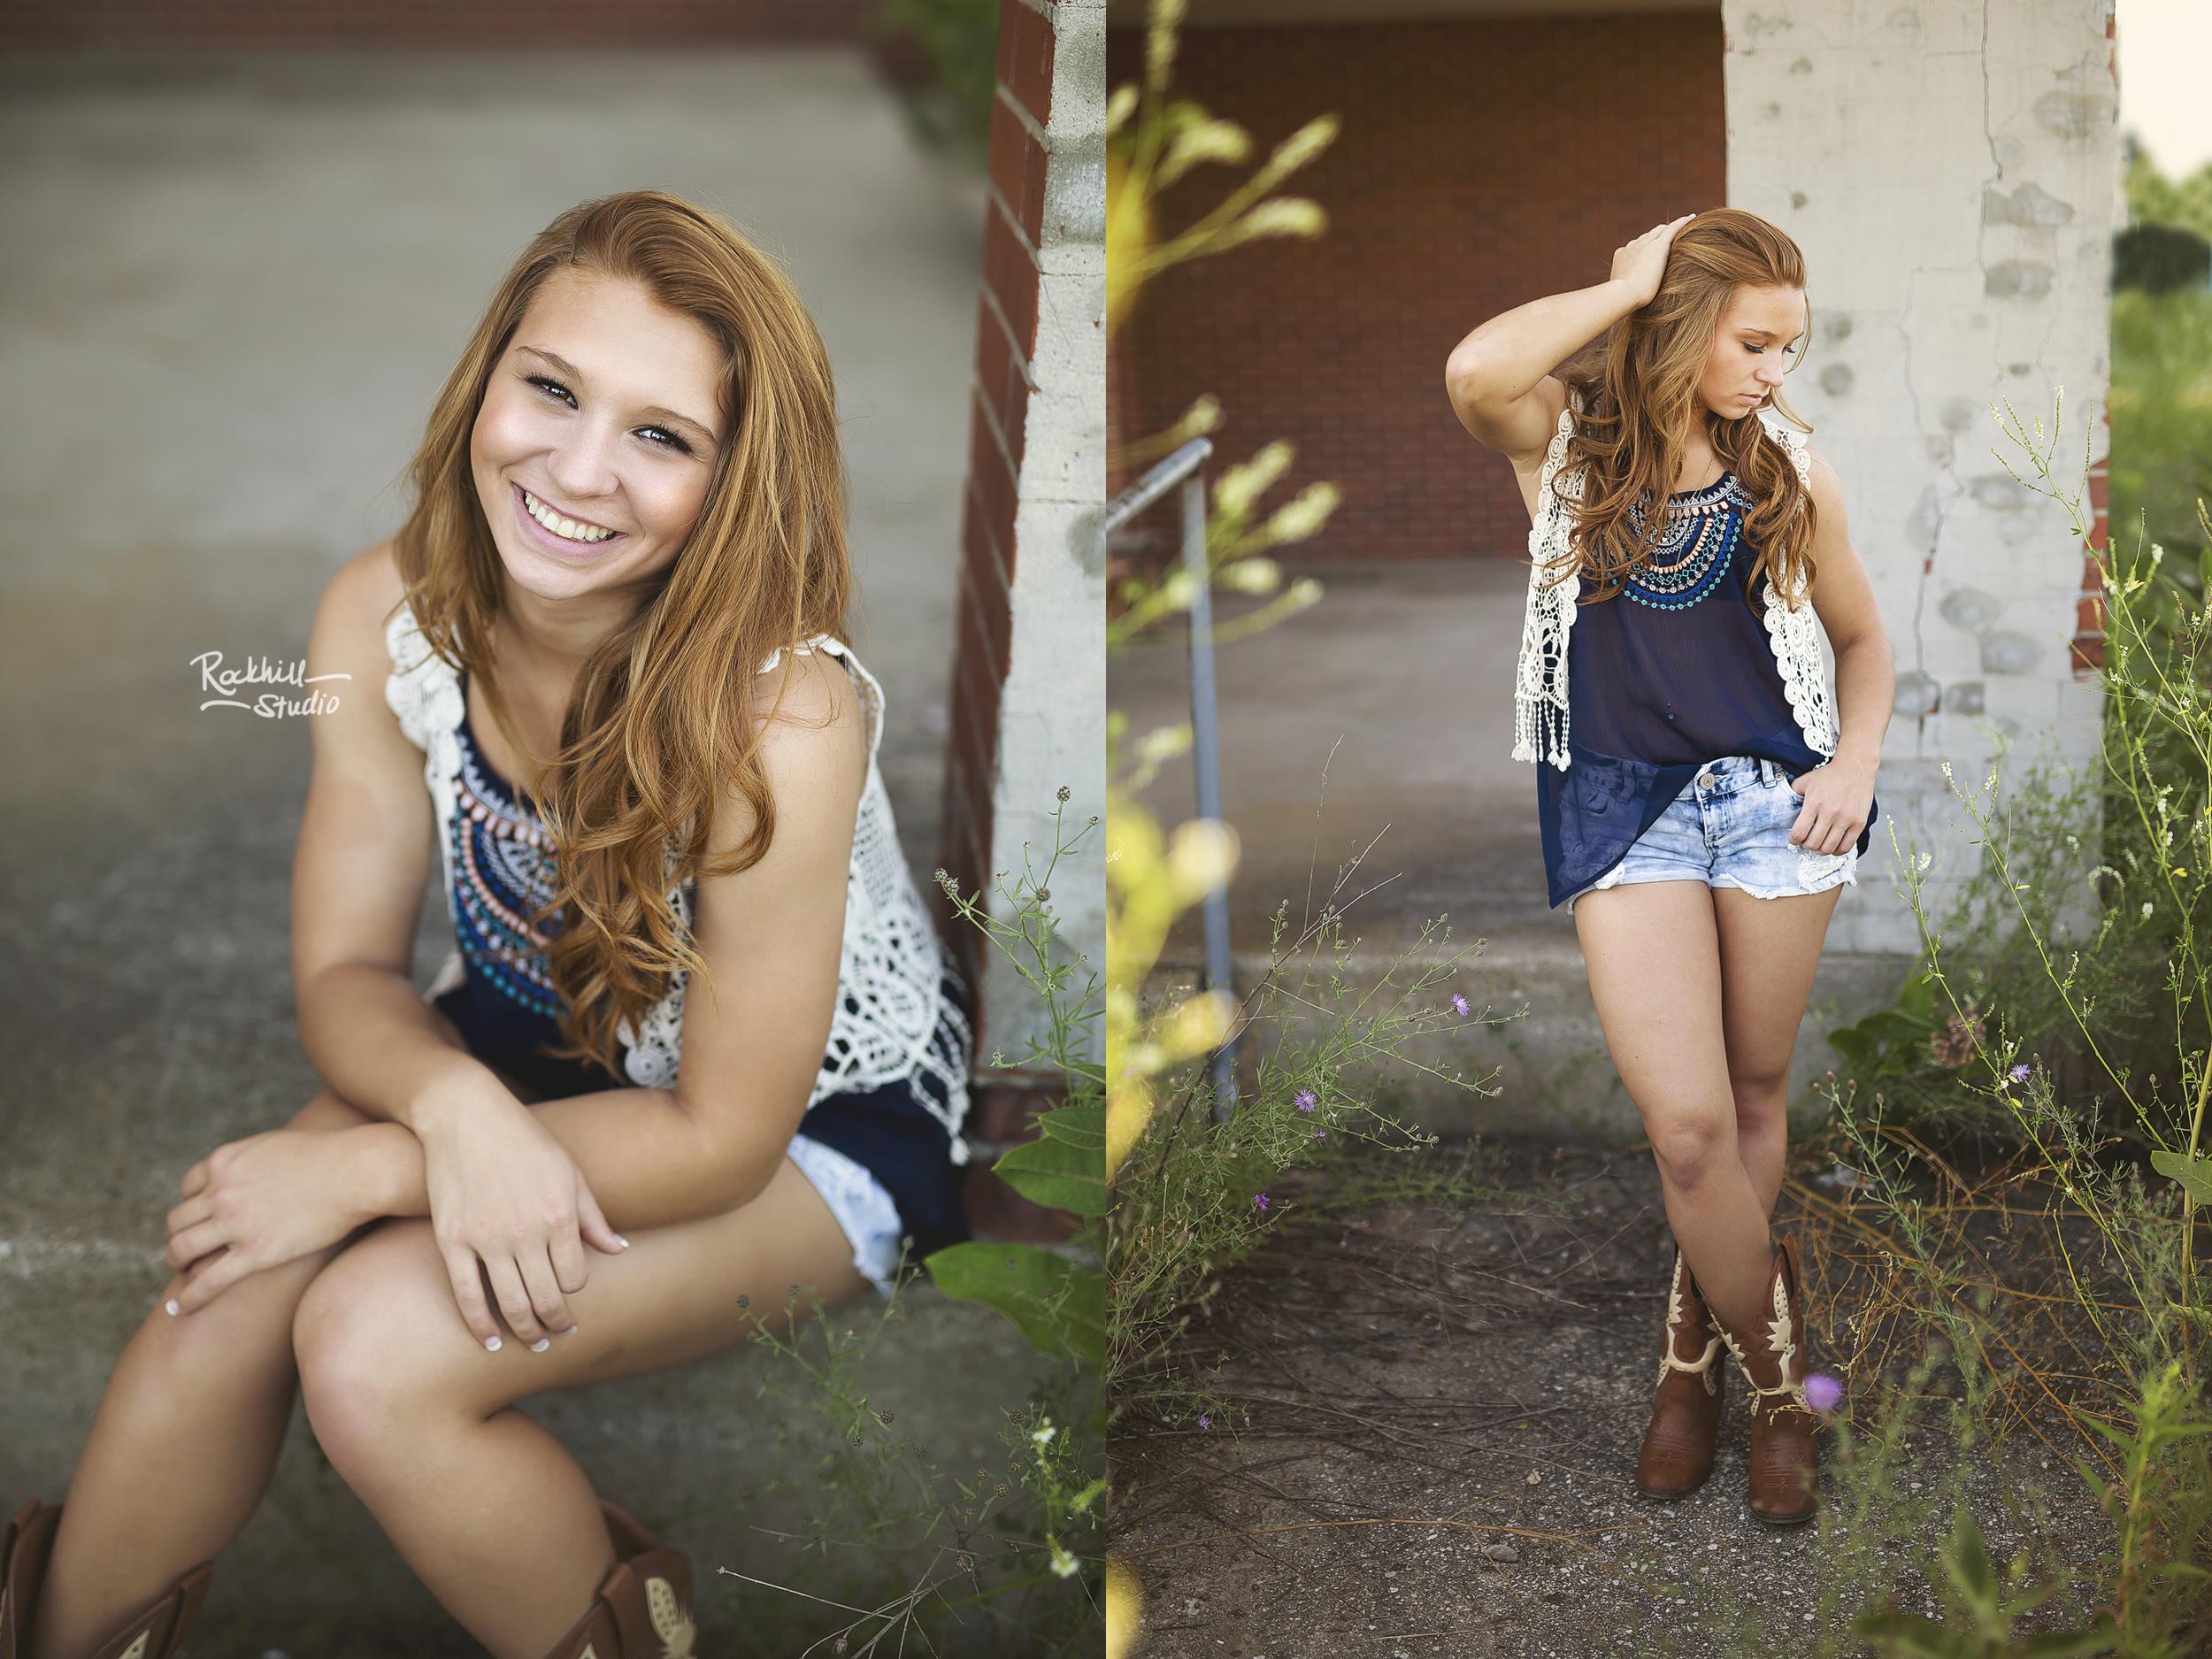 marquette-senior-photography-upper-peninsula-michigan-rockhill-studio-girl-urban-2.jpg